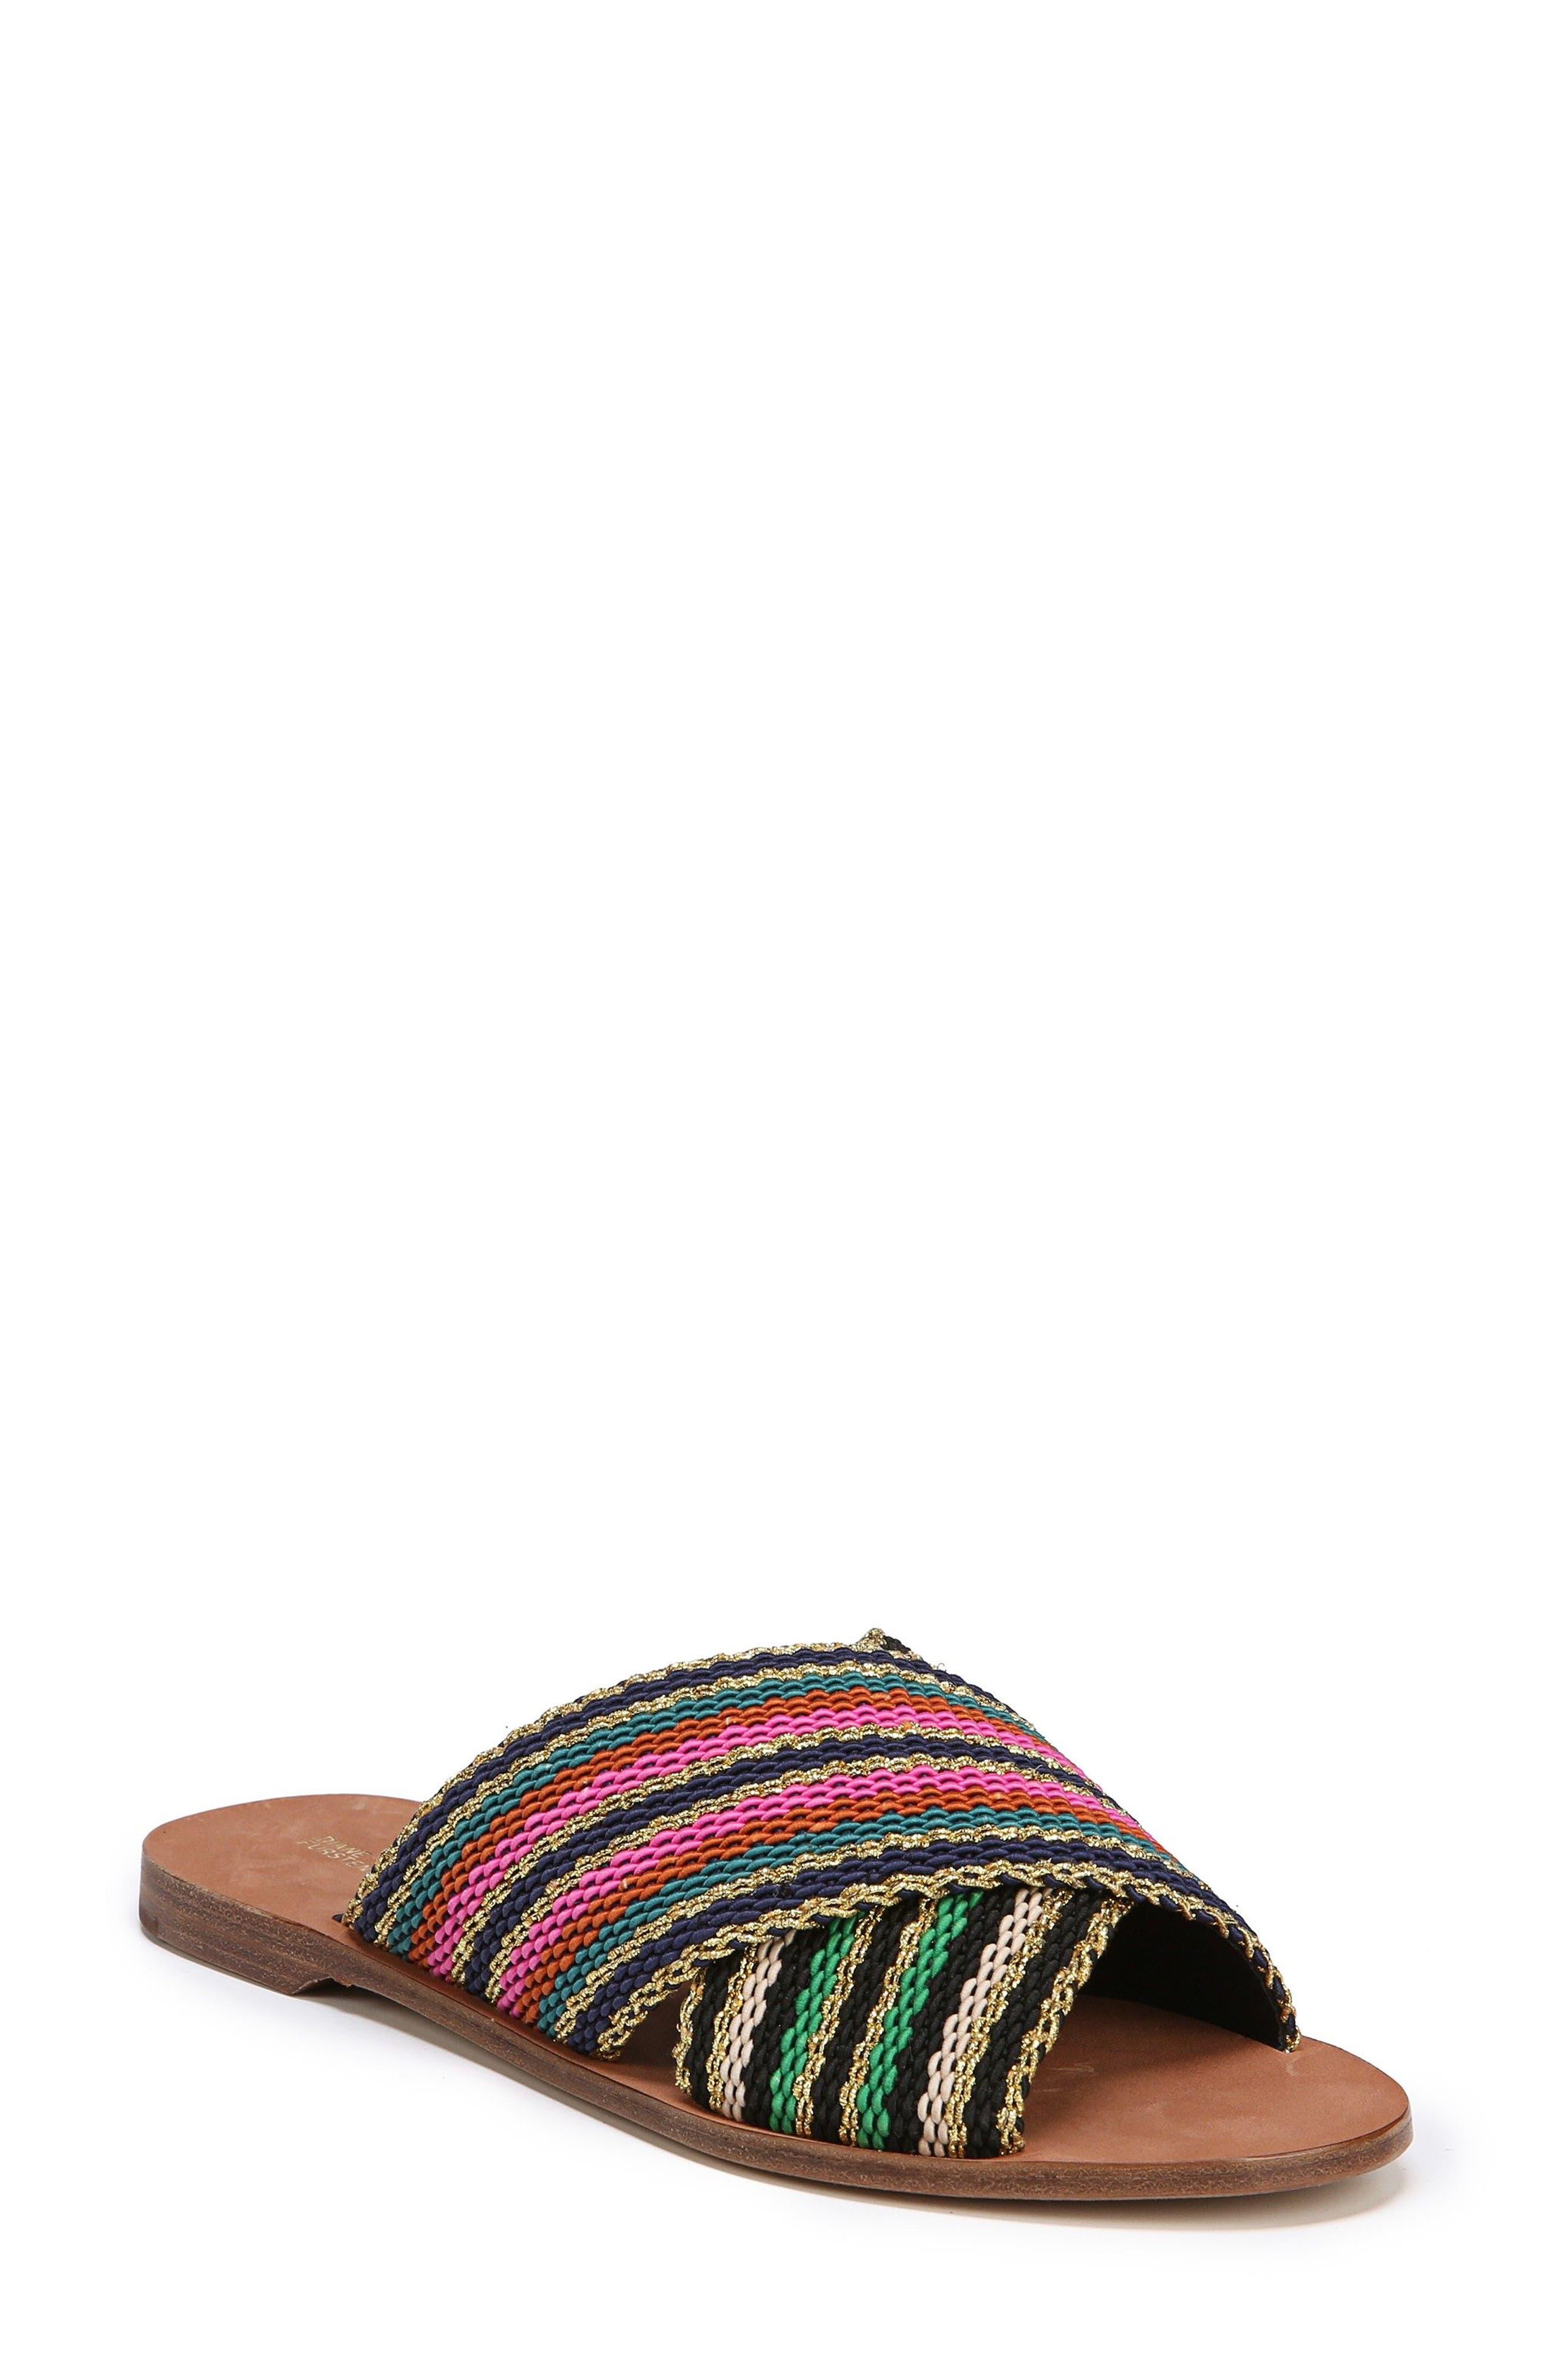 Cindi Woven Slide Sandal,                         Main,                         color, Black/ Gold